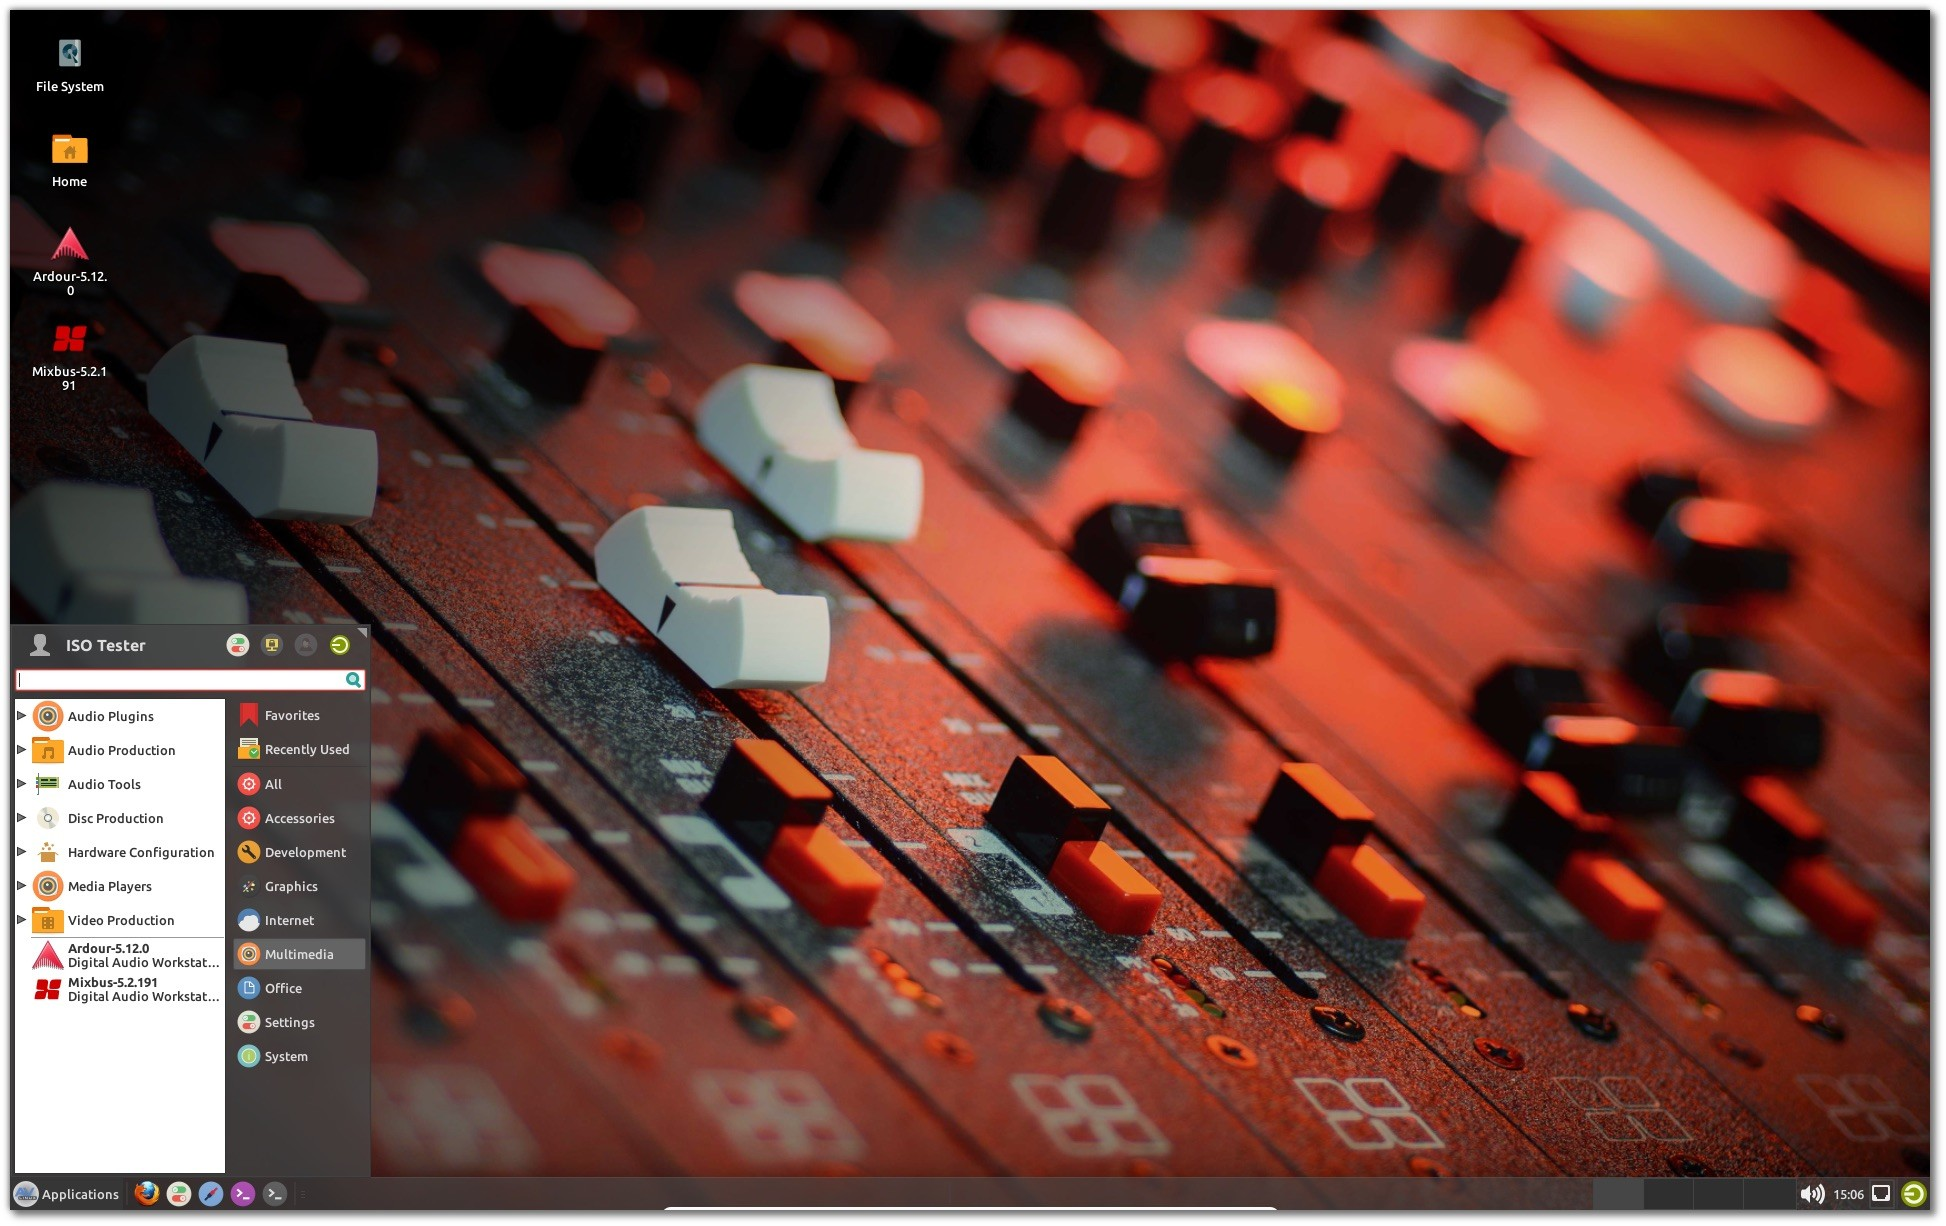 AV Linux to Drop 32-Bit Support, Focus Its Development on